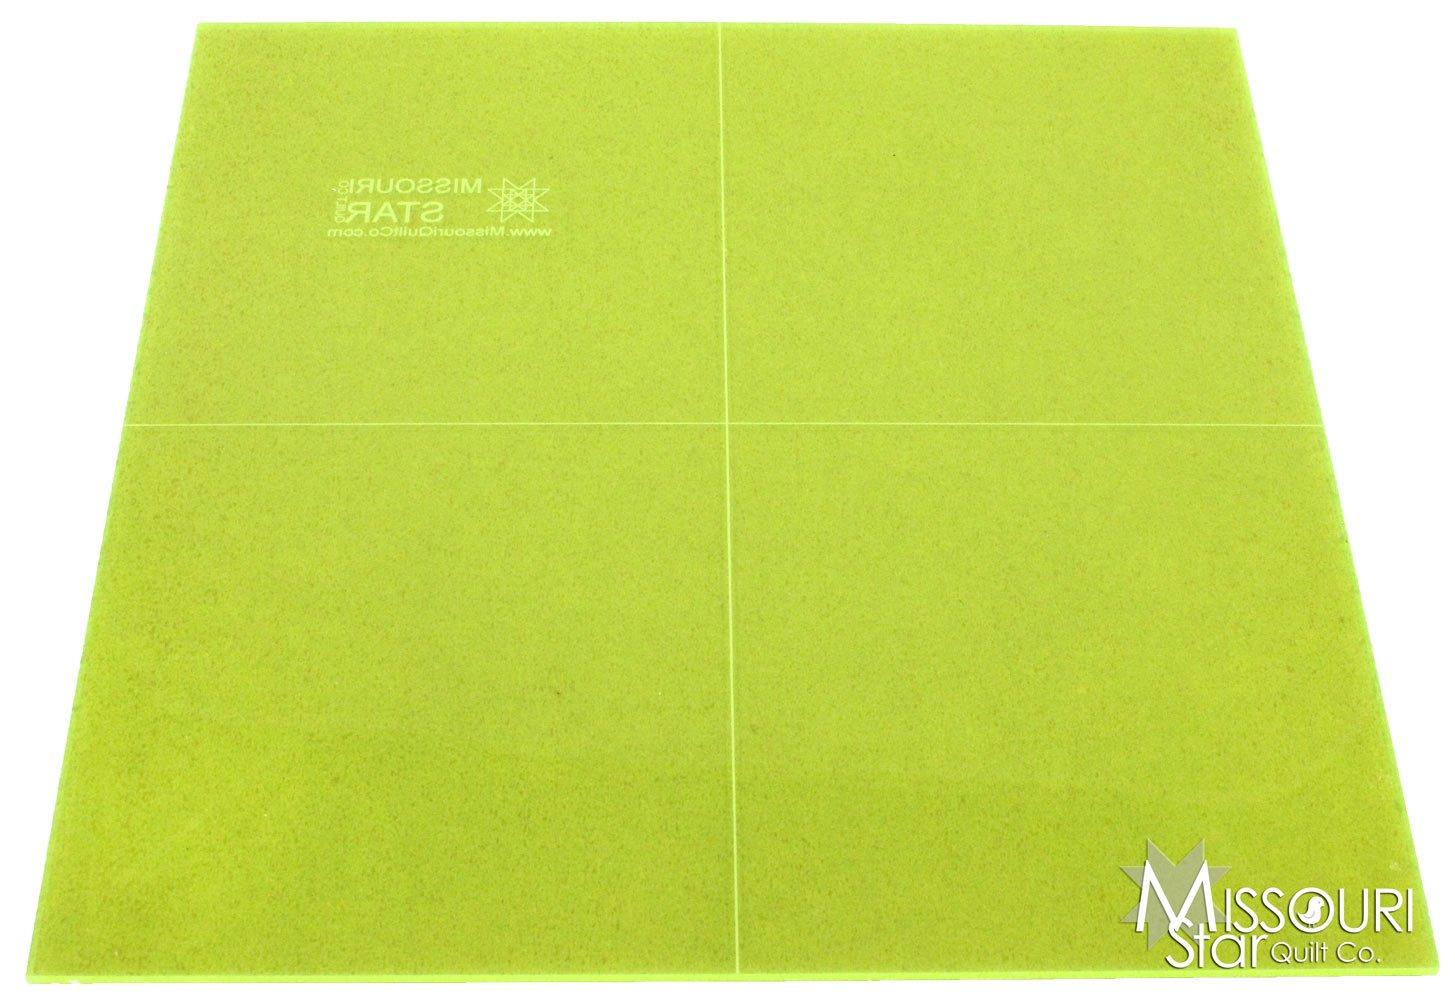 MSQC - 10  Square Template